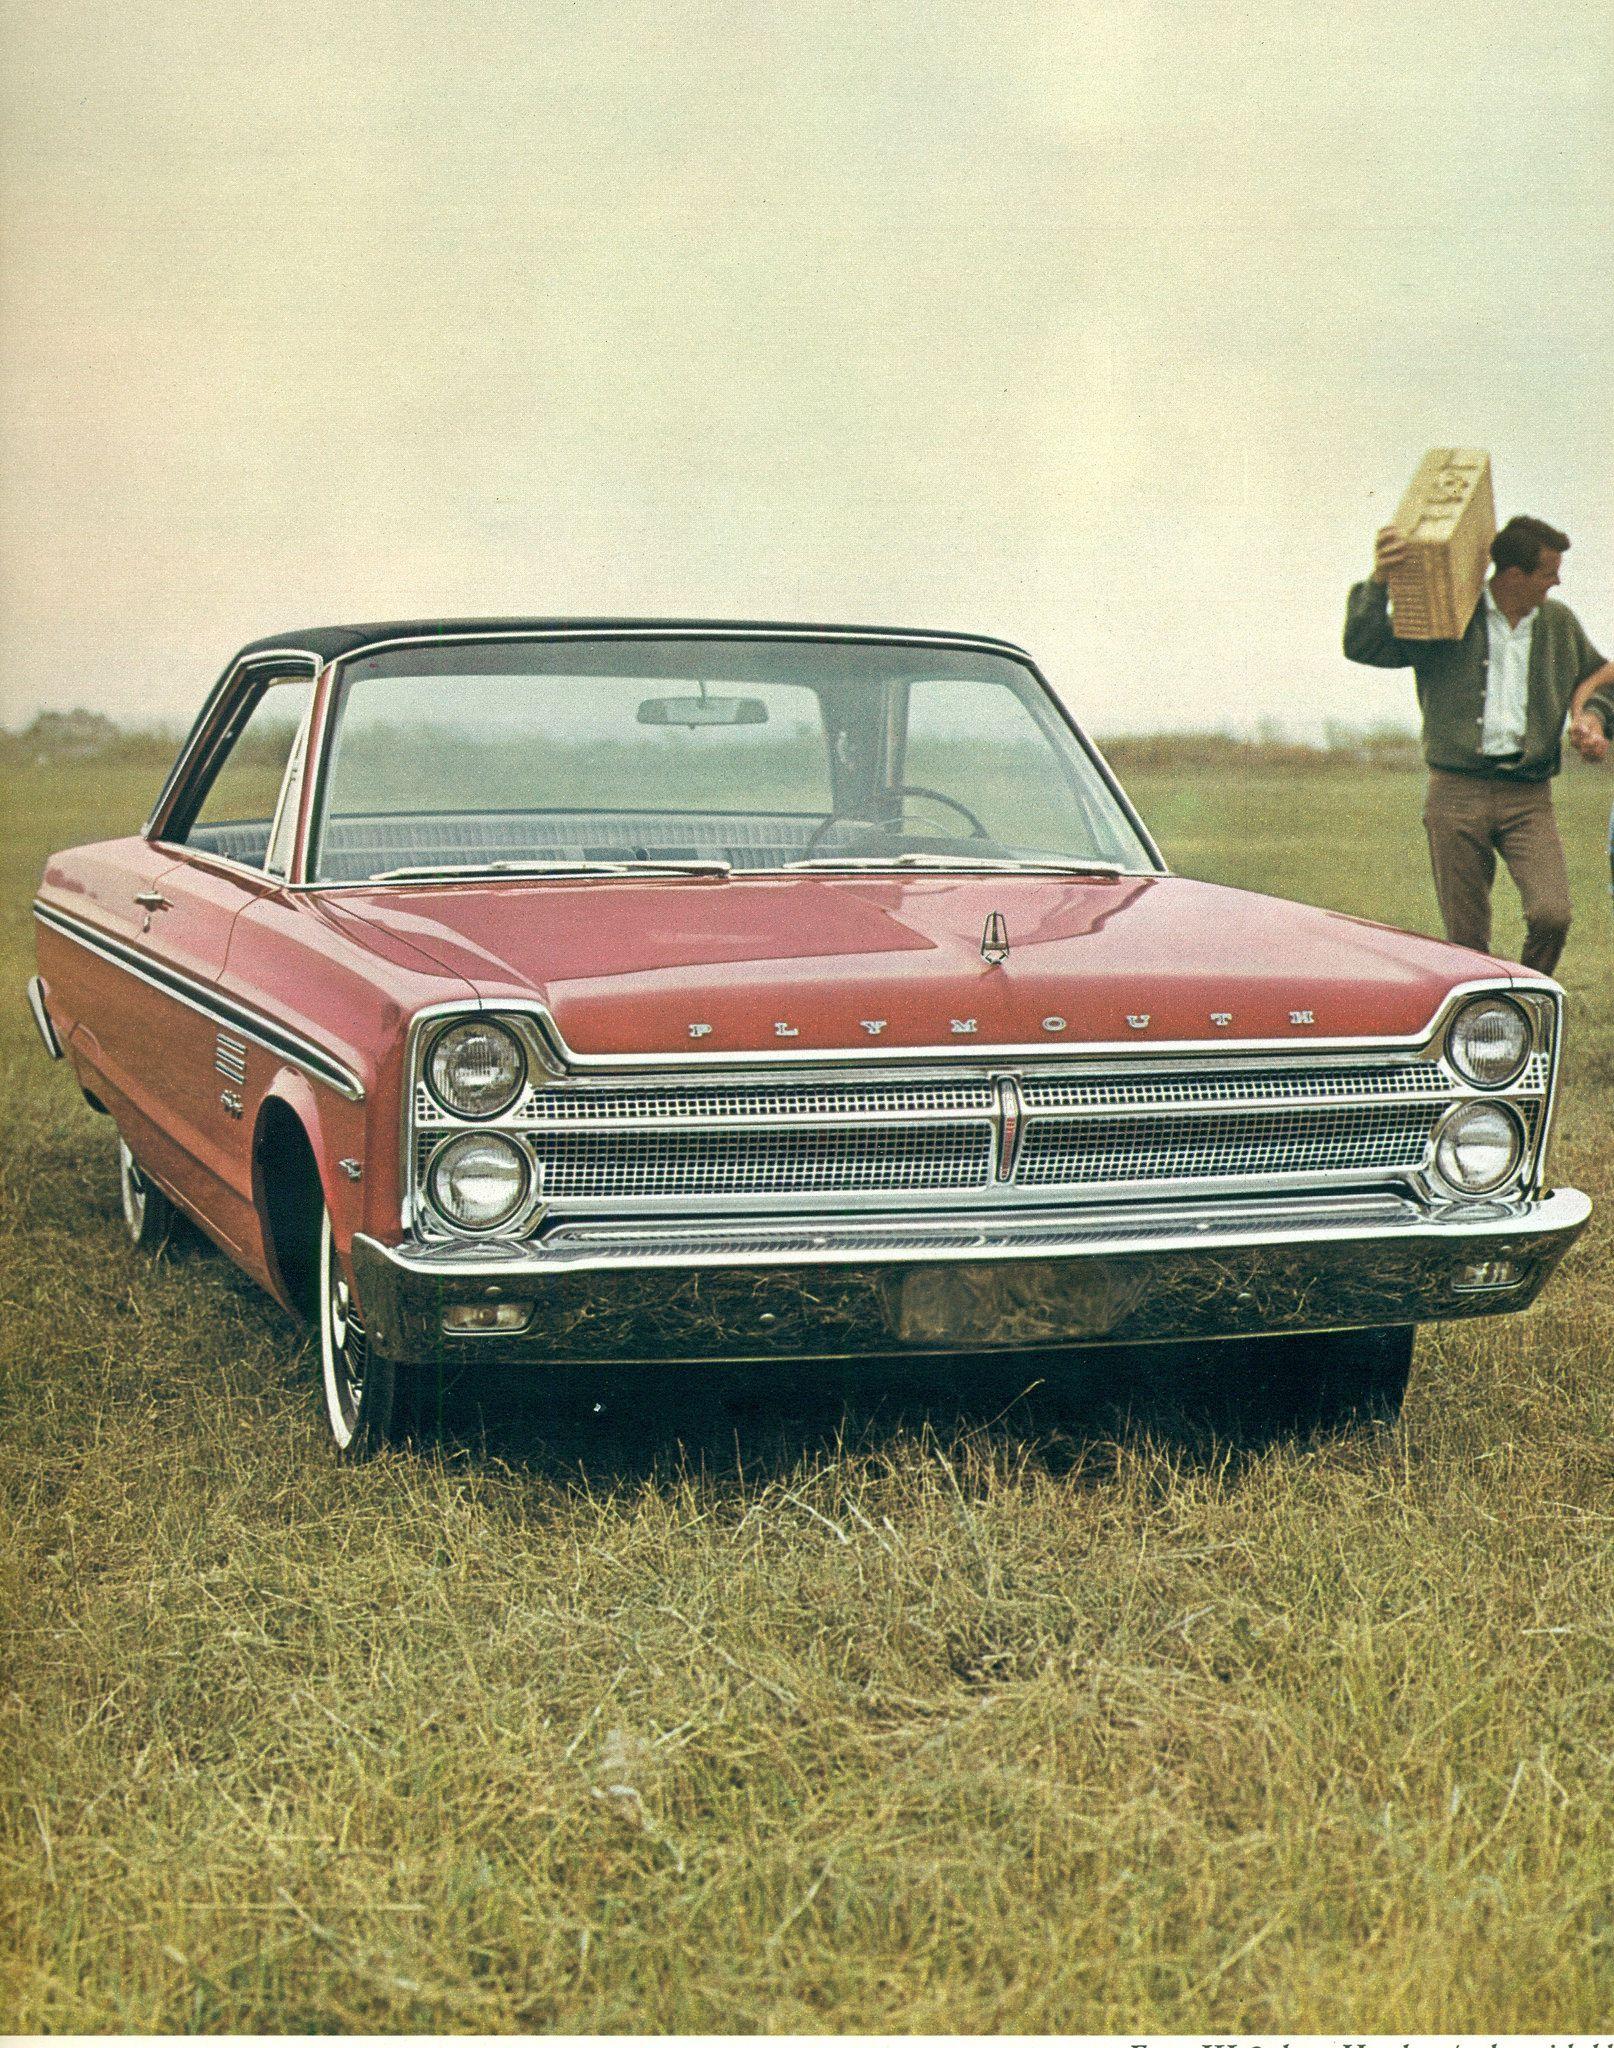 1965 Plymouth Fury III 2 Door Hardtop   Plymouth fury, Plymouth ...